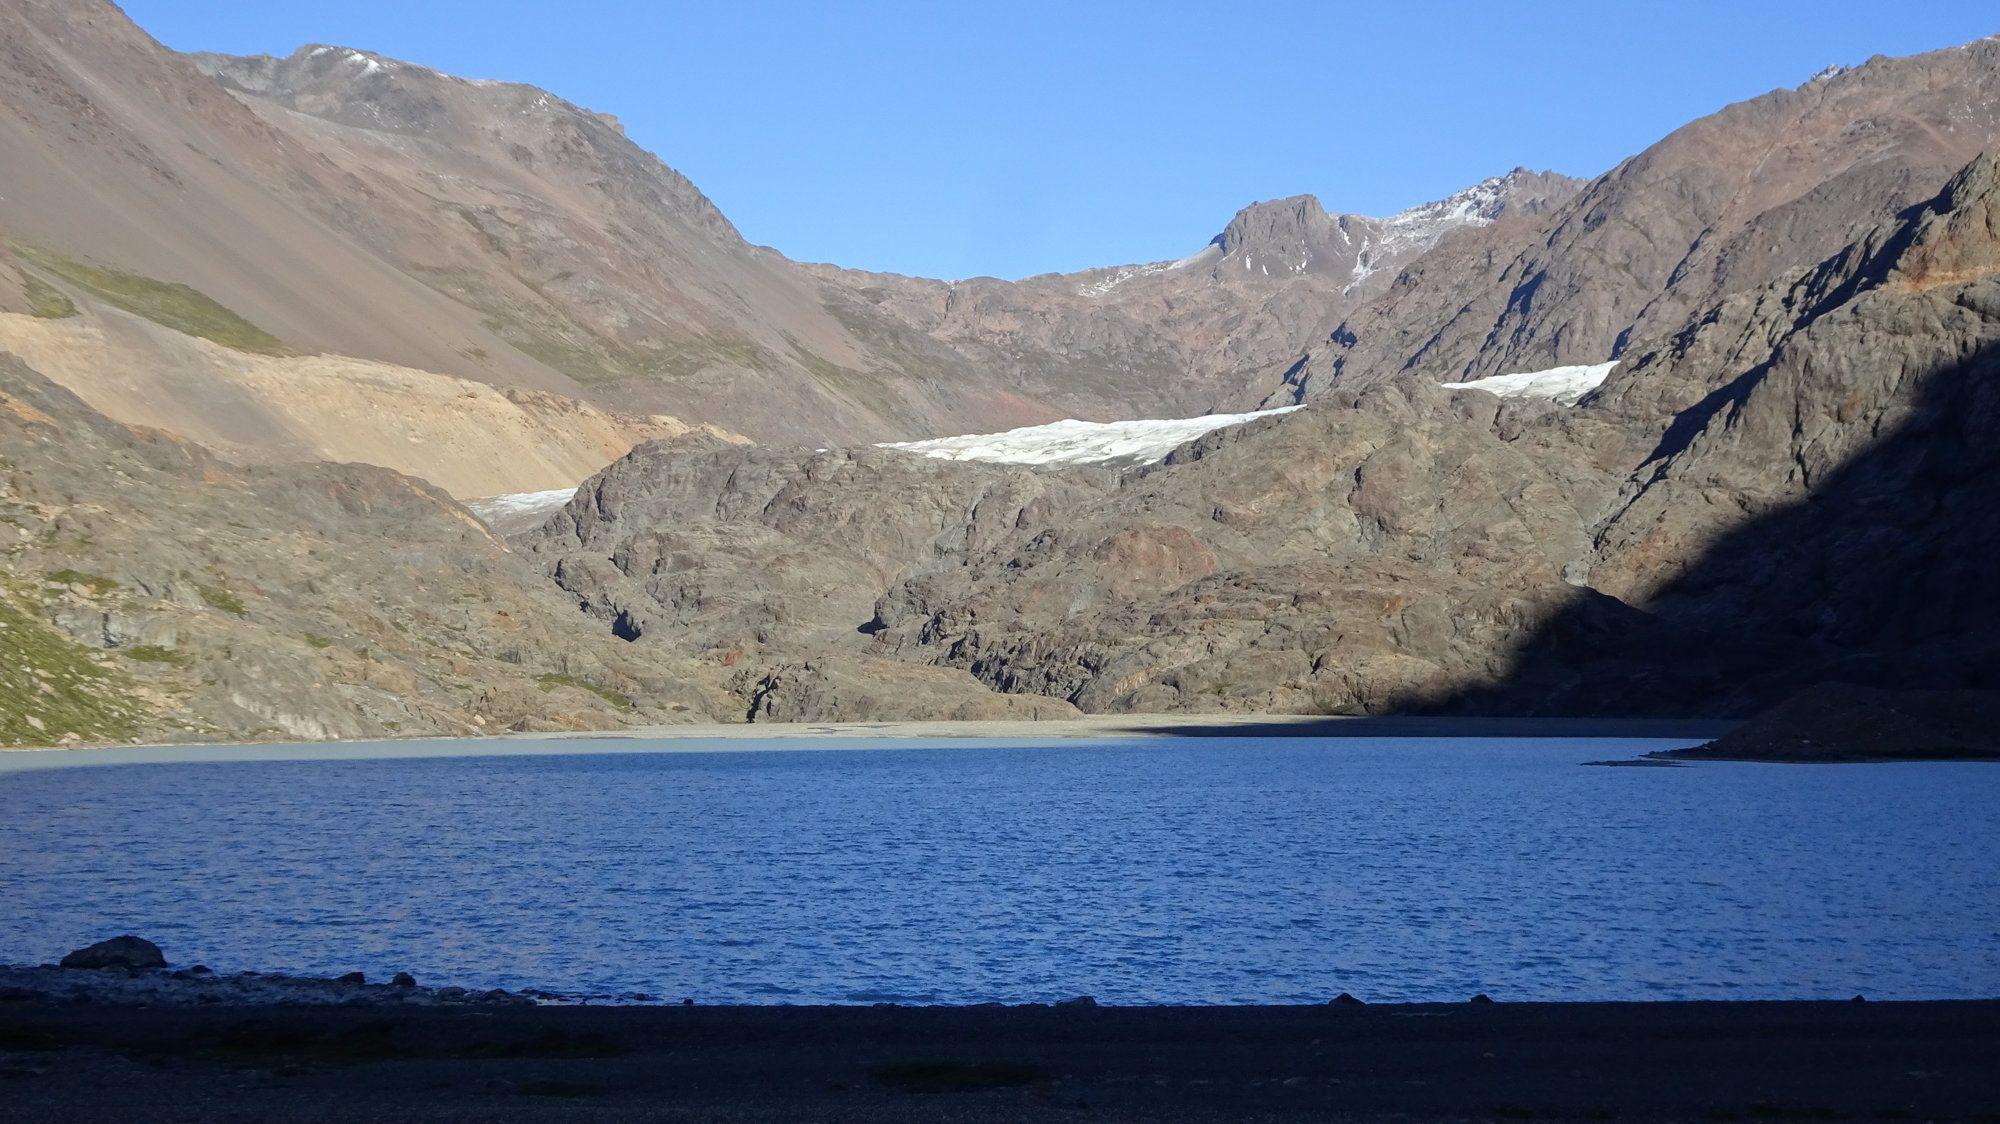 Laguna Toro, Huemul Circuit, El Chaltén, Patagonien, Argentinien, Wanderung, Trekking